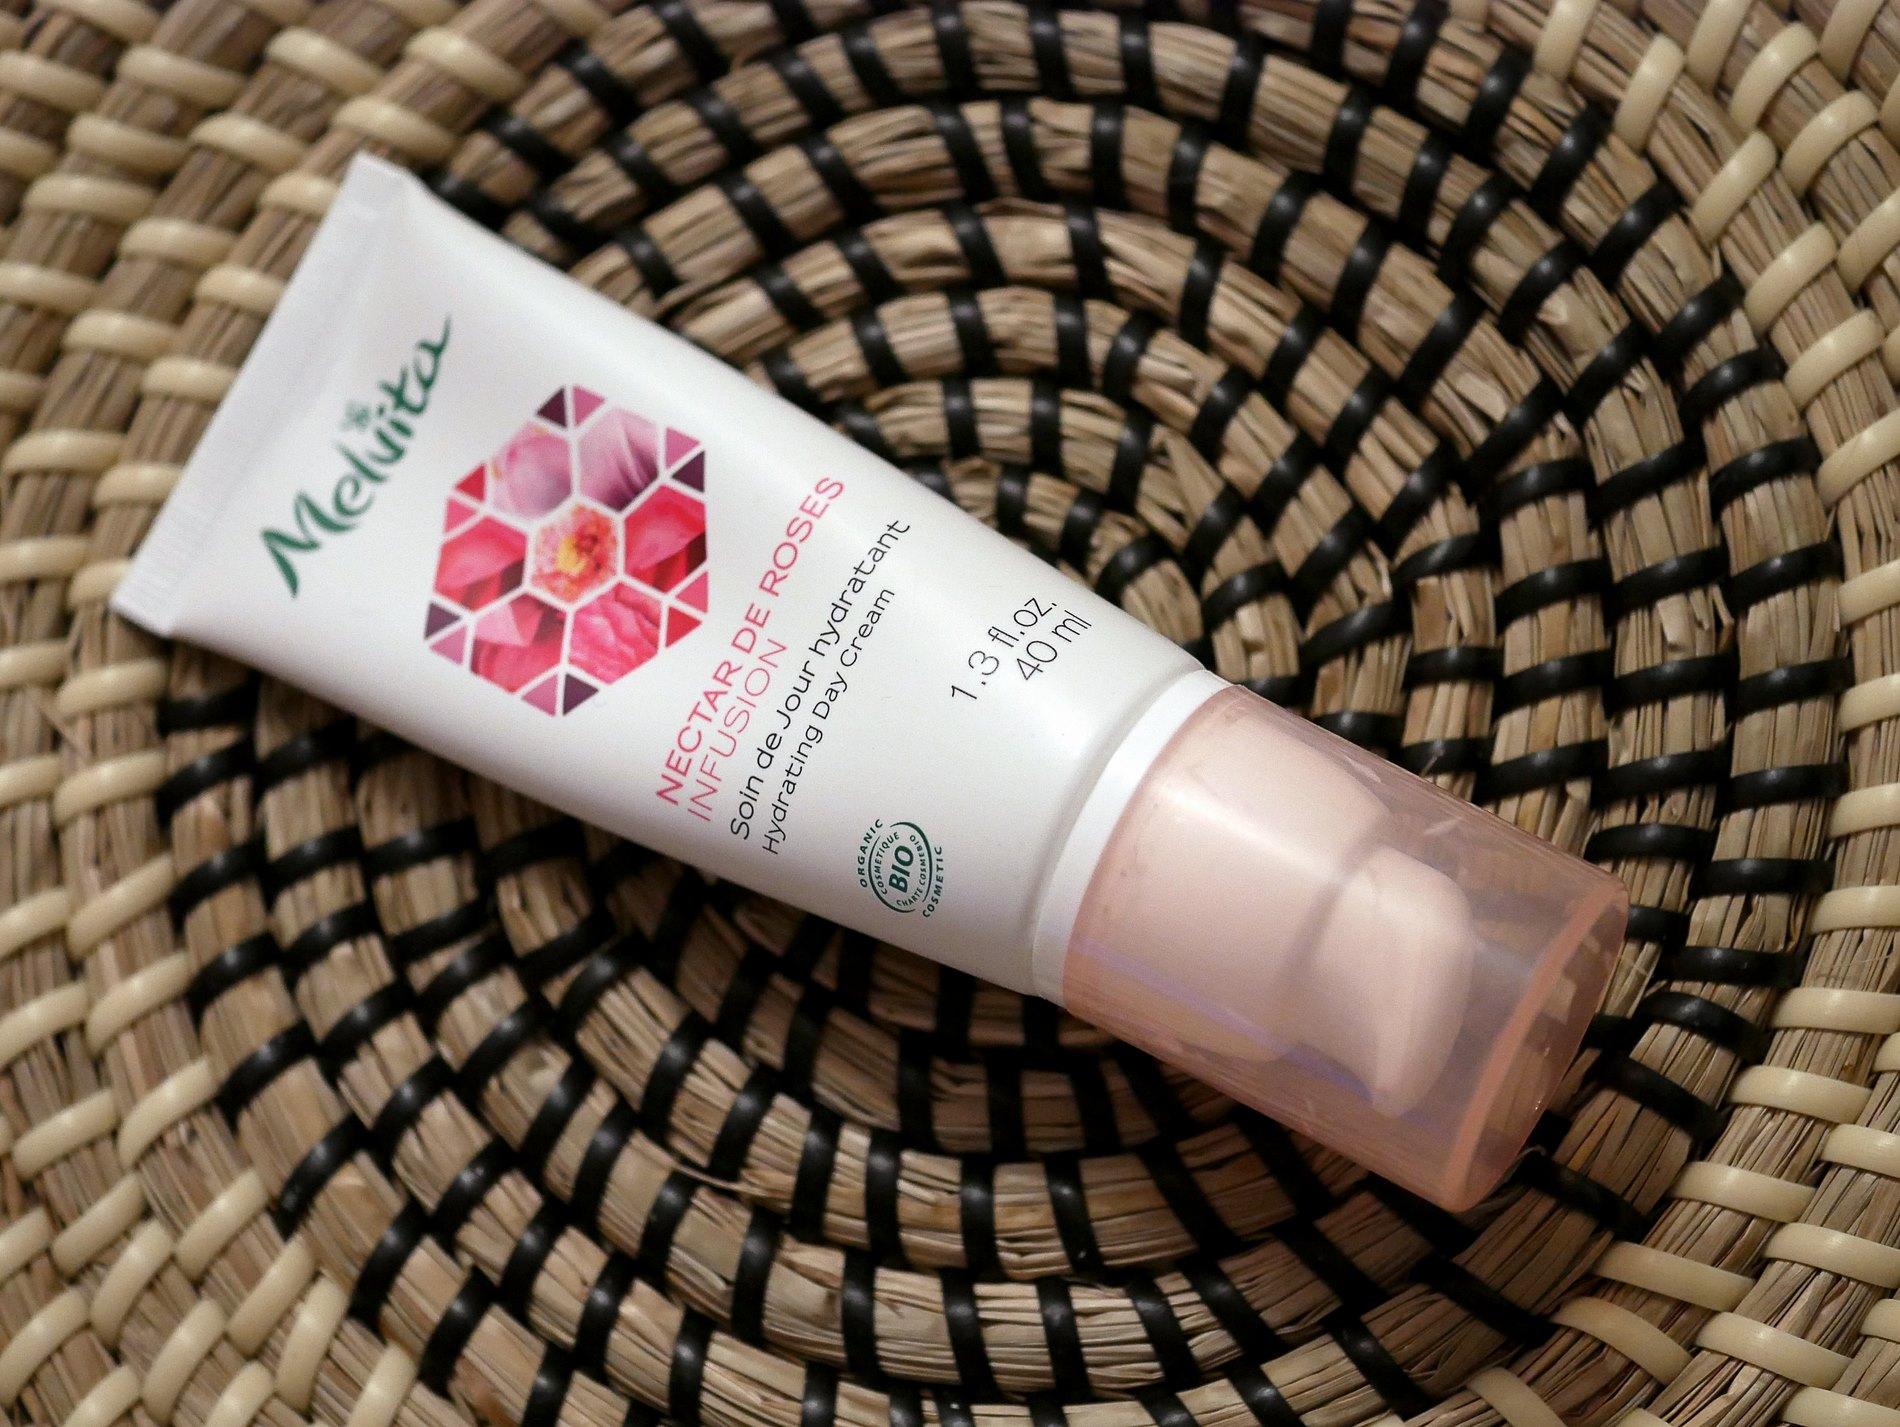 soin de jour hydratant rose melvita - juliesliberties